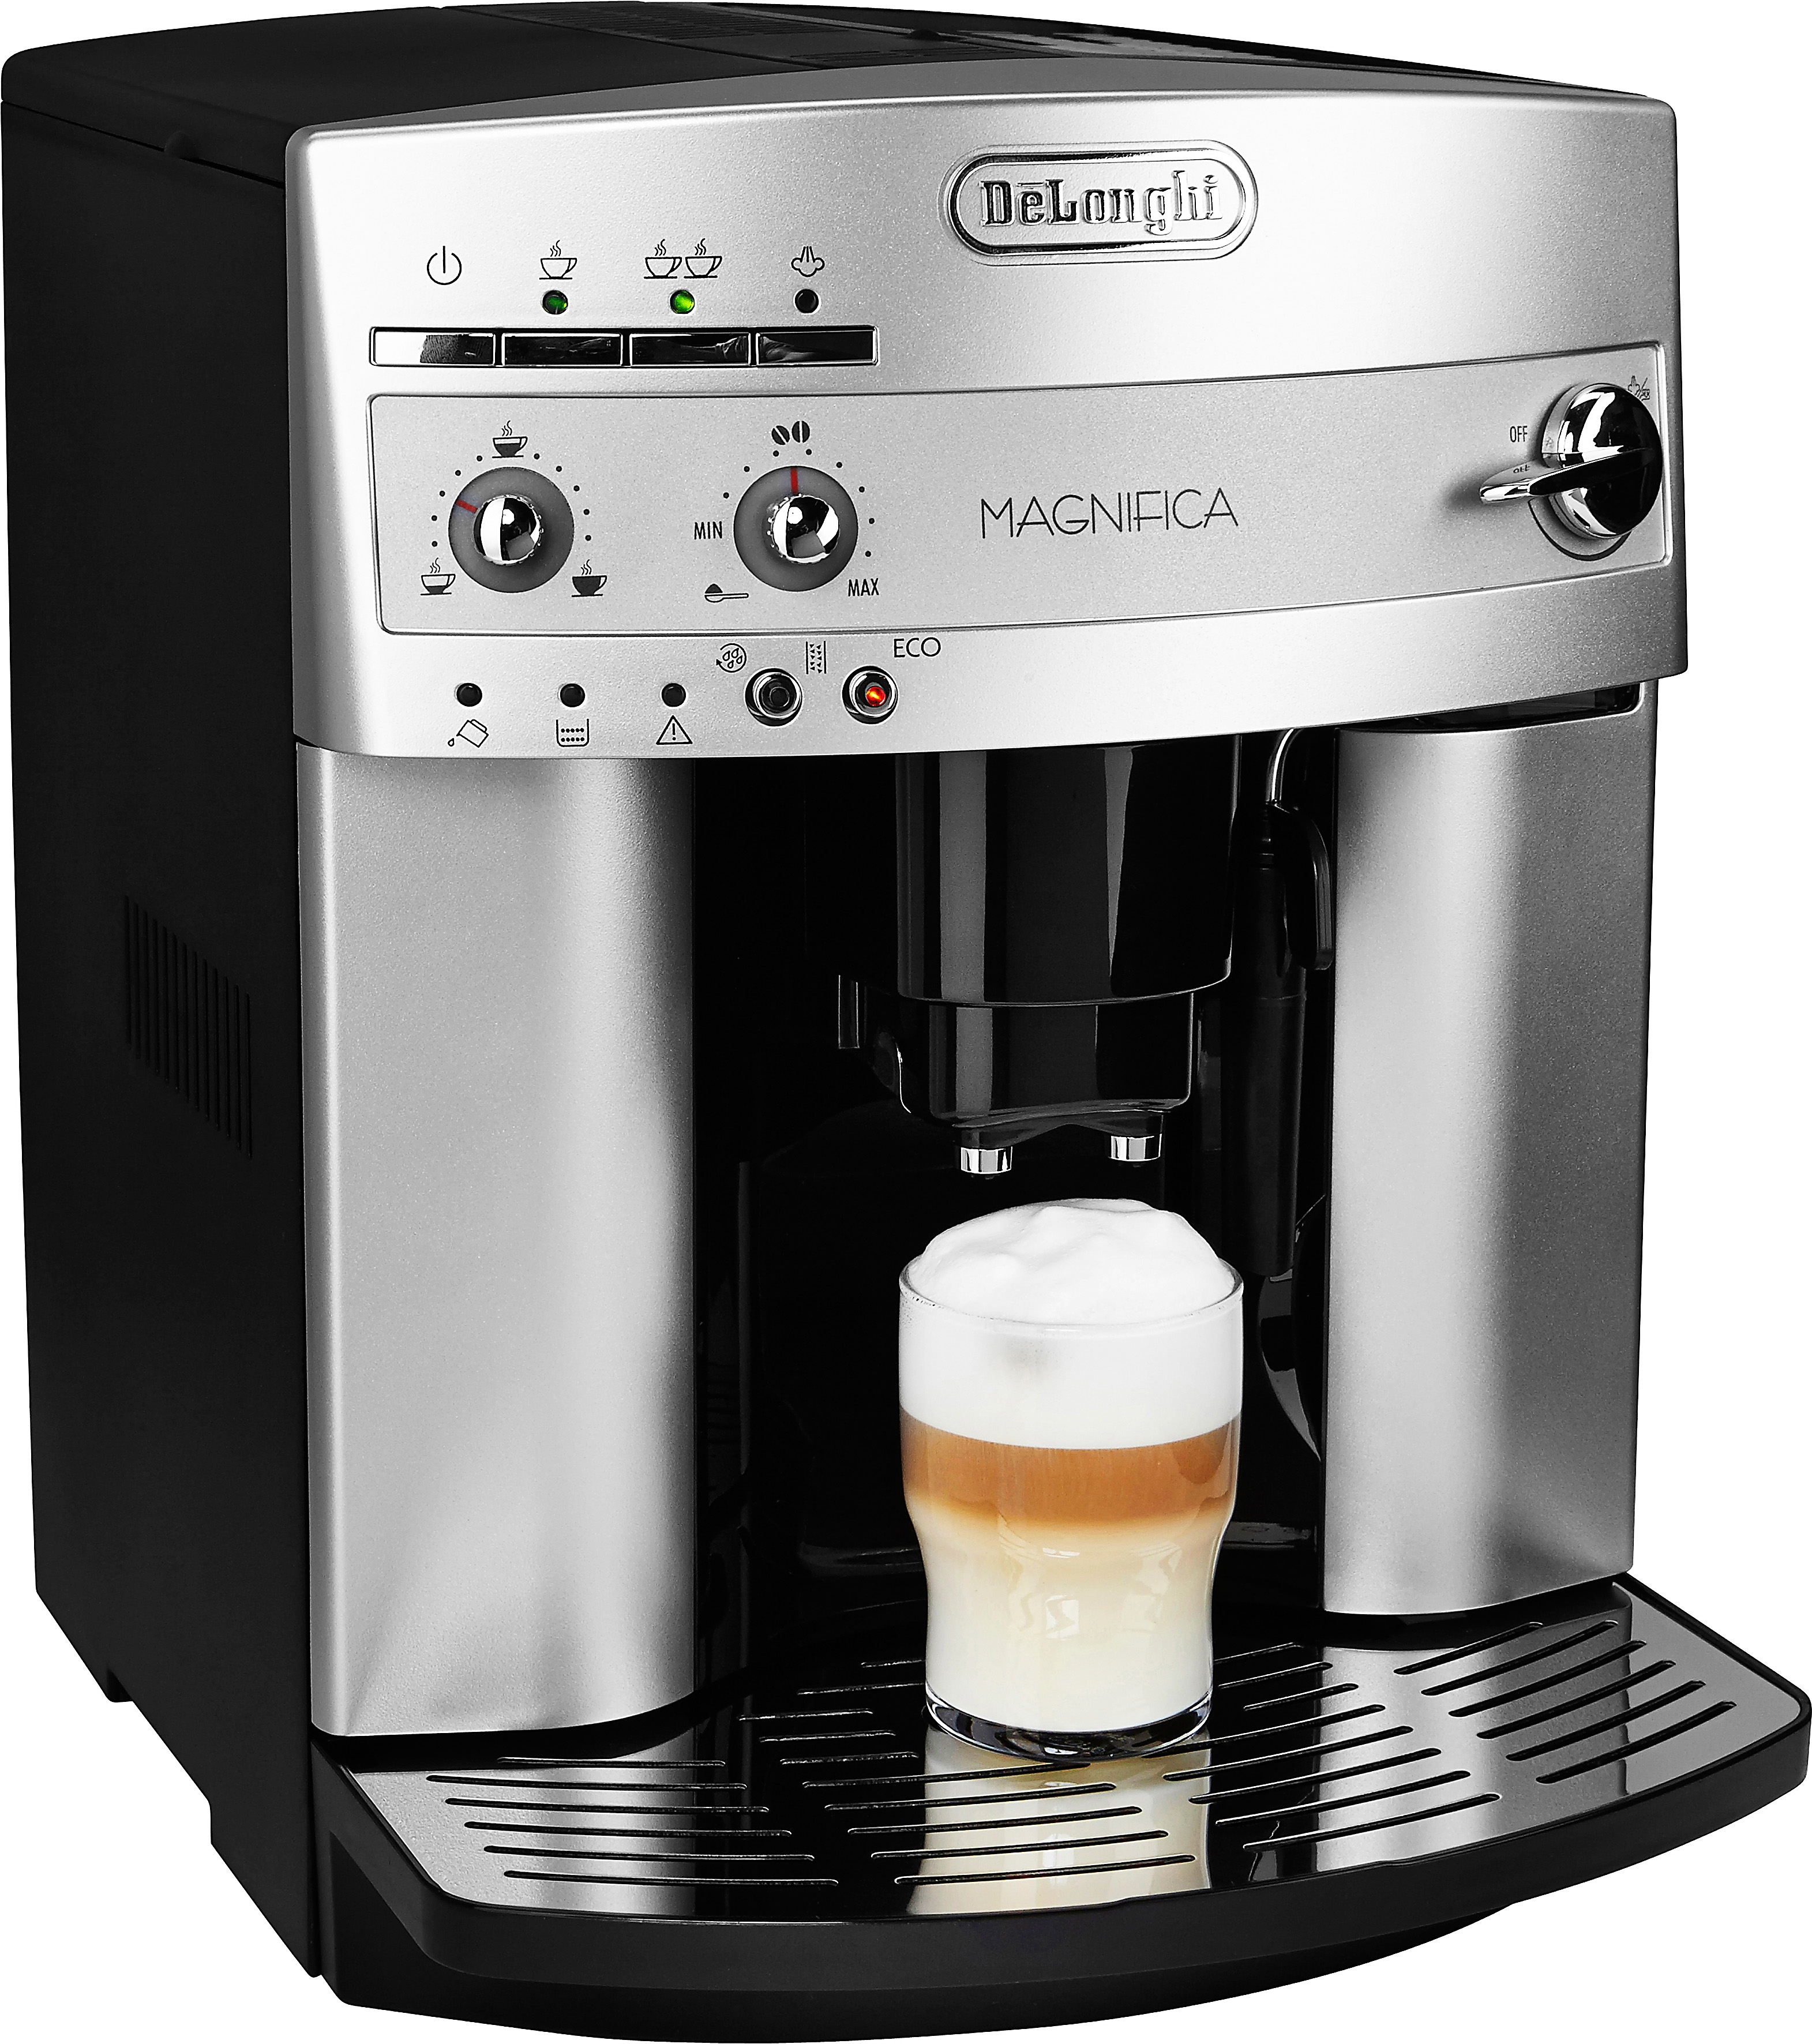 De'longhi Volautomatisch espresso-apparaat, DeLonghi, 'ESAM 3000 Magnifica Eleganza' veilig op otto.nl kopen